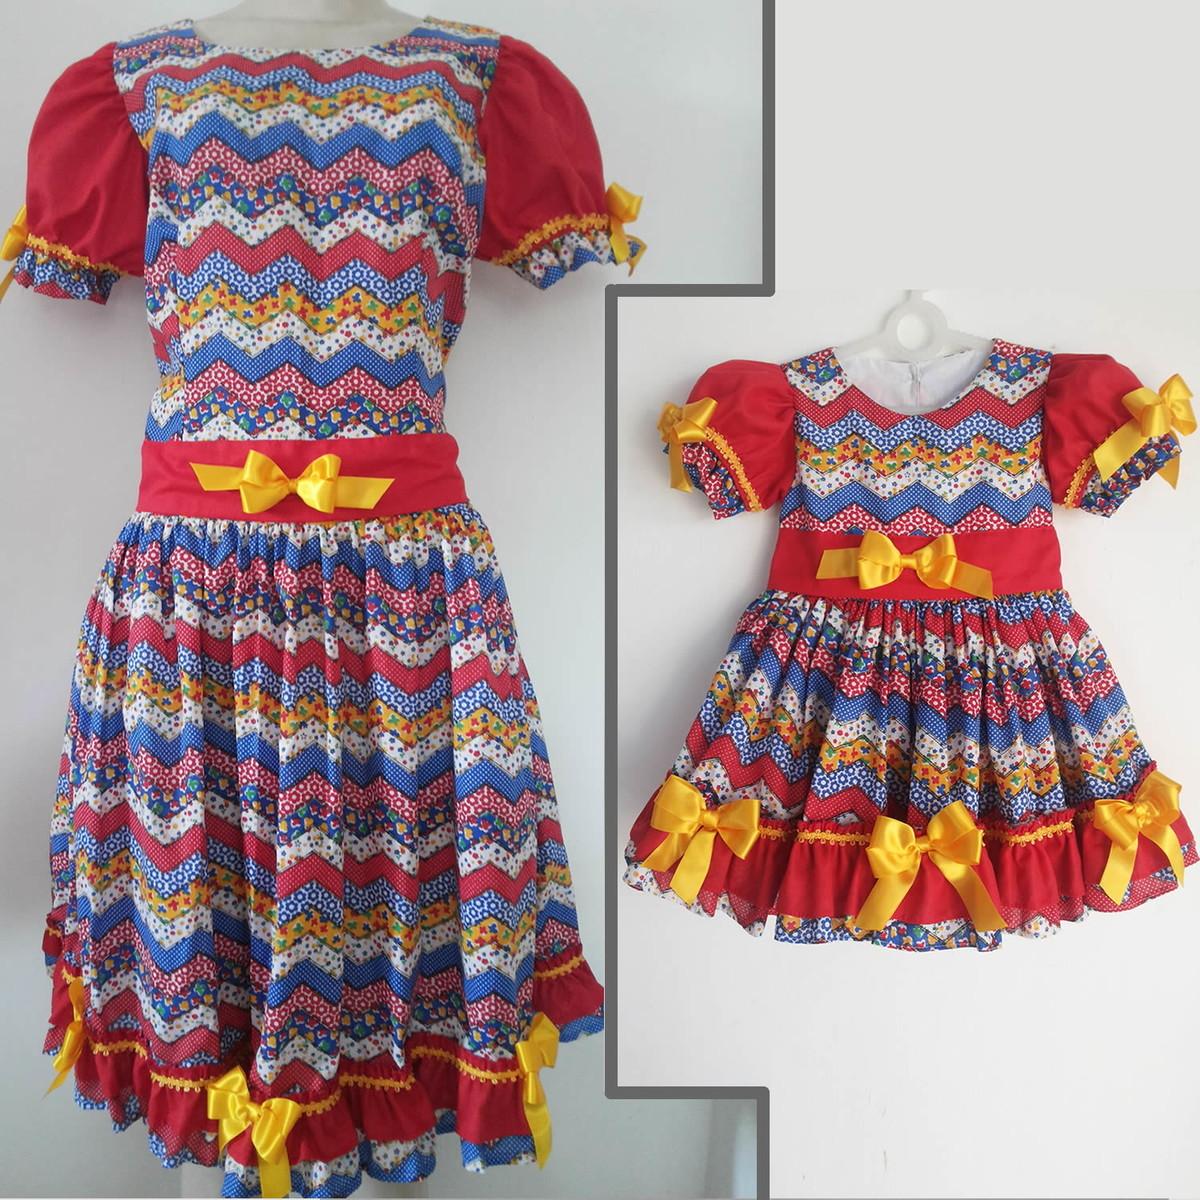 4a4e2311f87268 3 Vestidos. 1 Vestido junino tal mãe, 2 tal filha